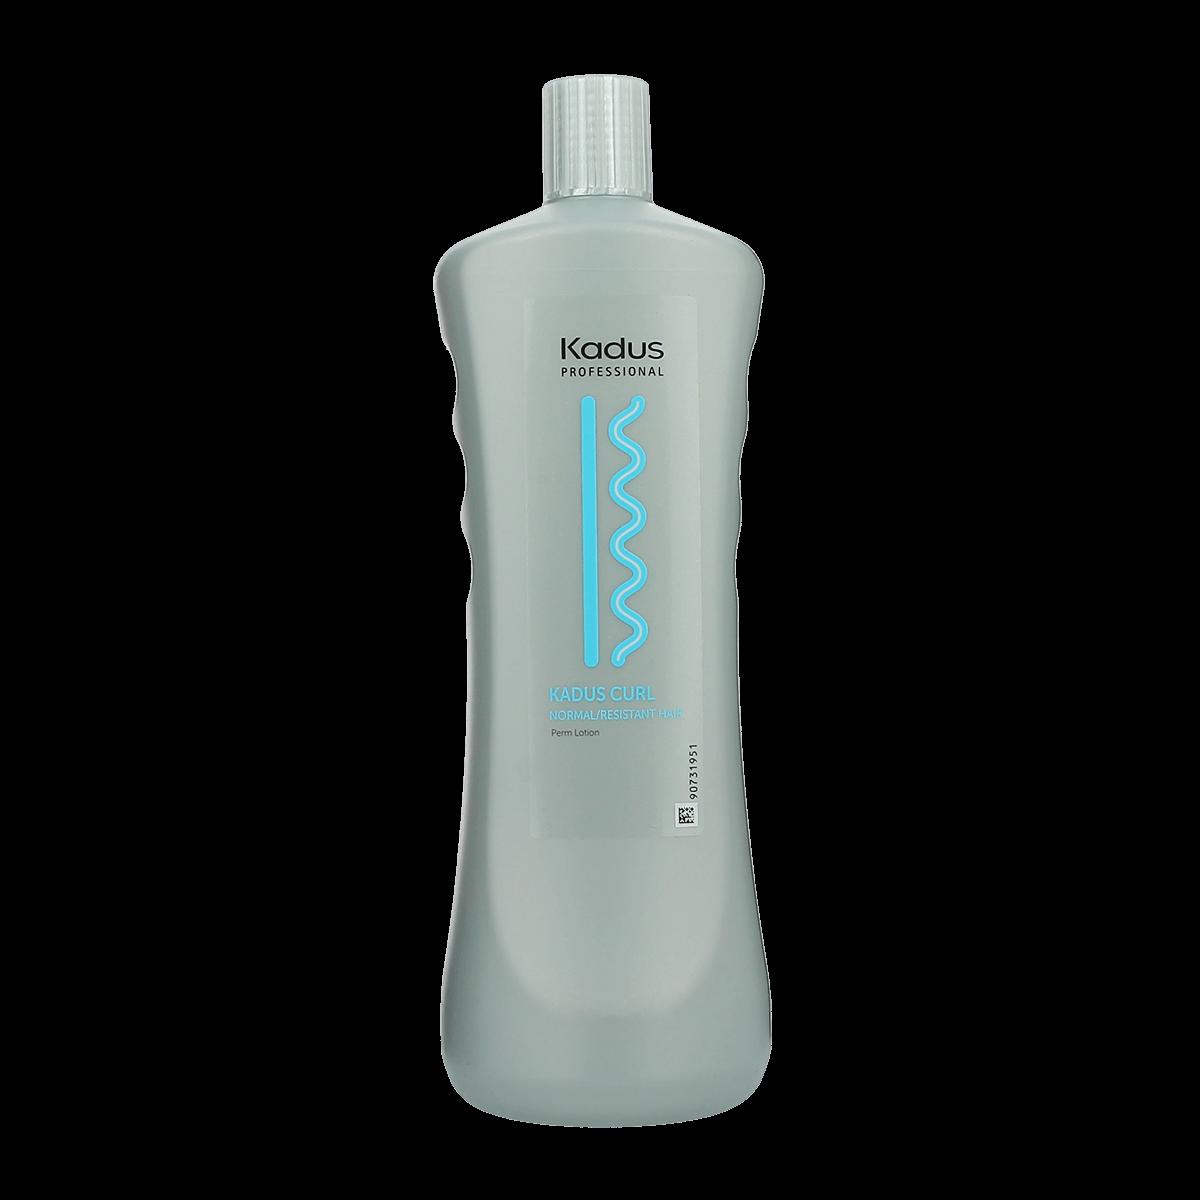 Buy Kadus Professional Curl Normal Resistant Hair 1000ml Salon Wholesale